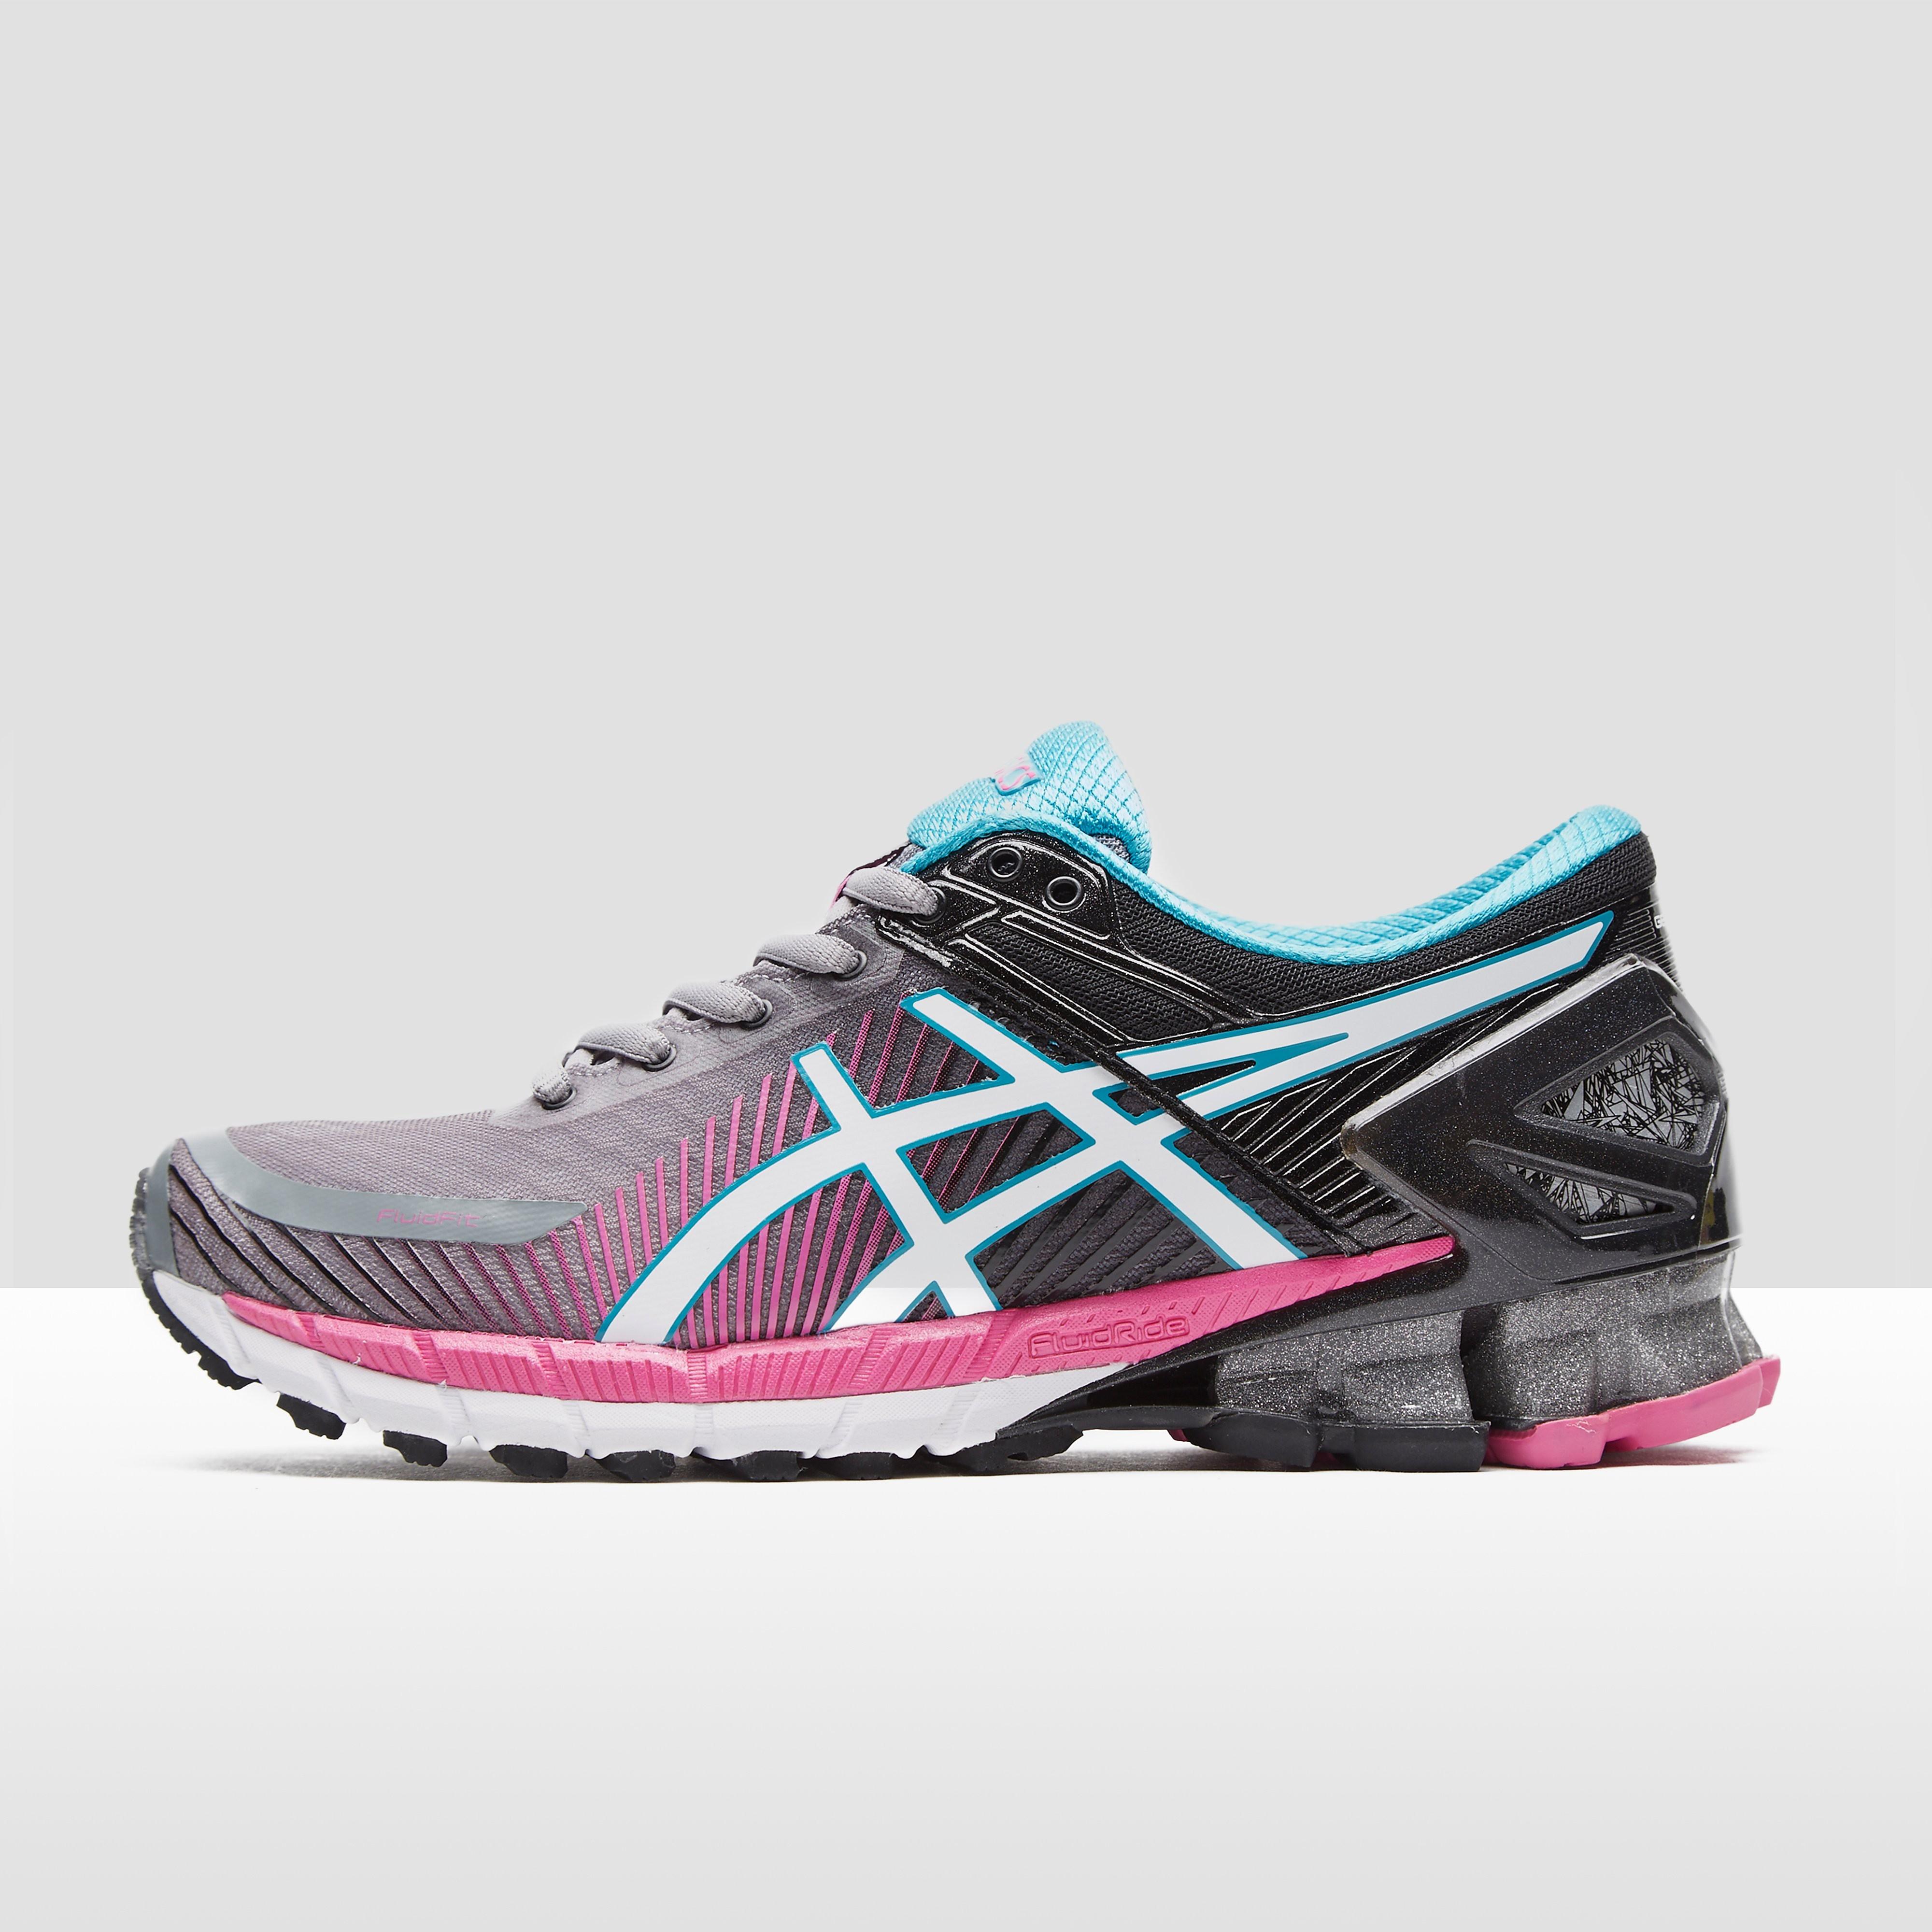 ASICS GEL-Kinsei 6 Women's Running Shoes